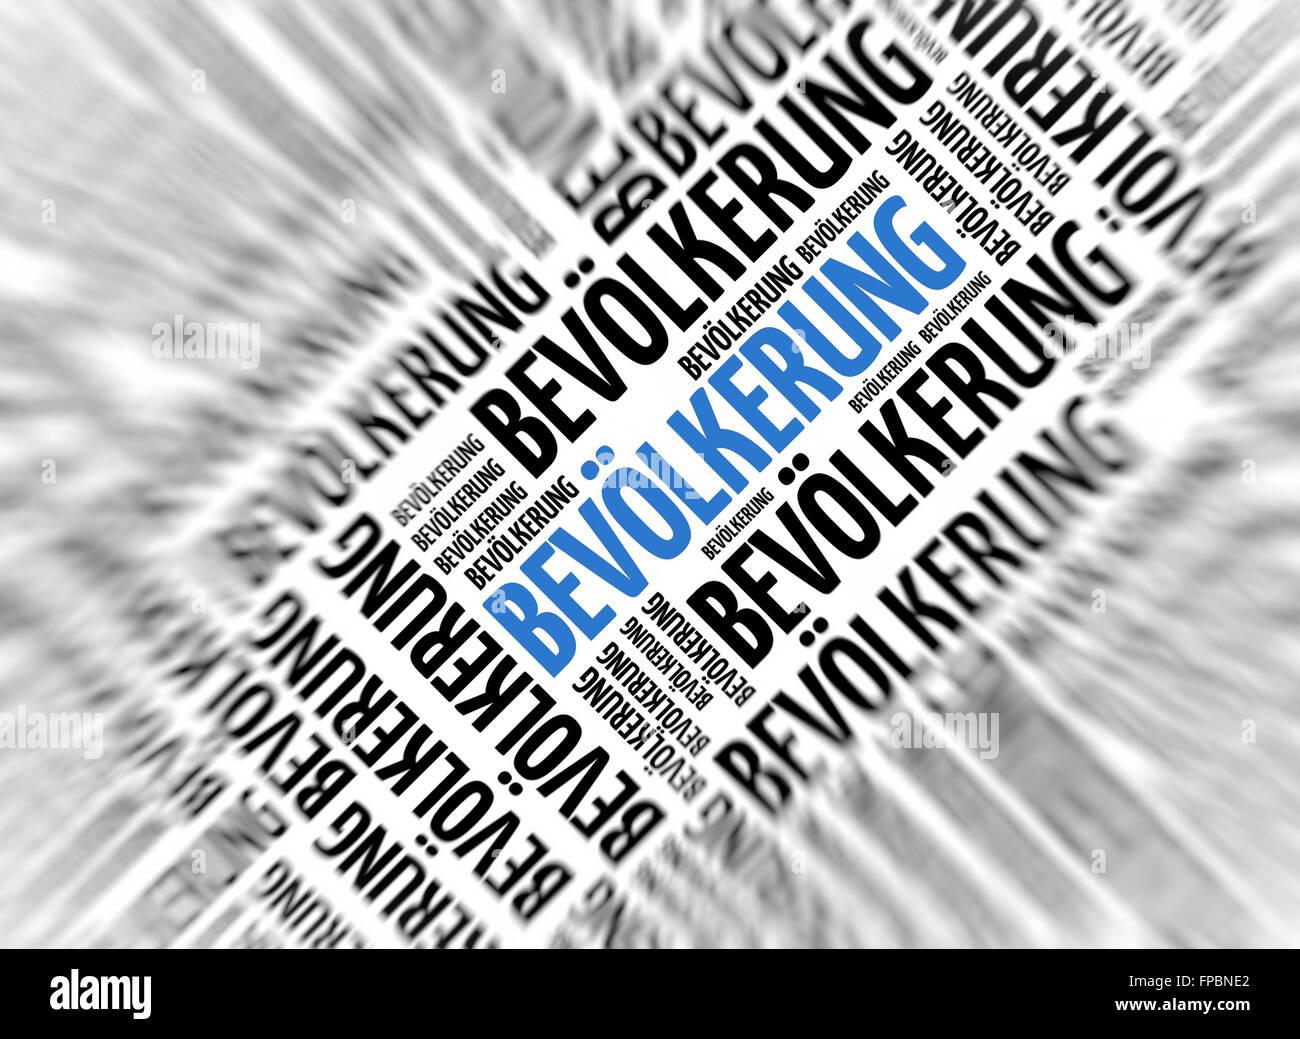 German marketing background - Bevölkerung (Population) - blur and focus Stock Photo